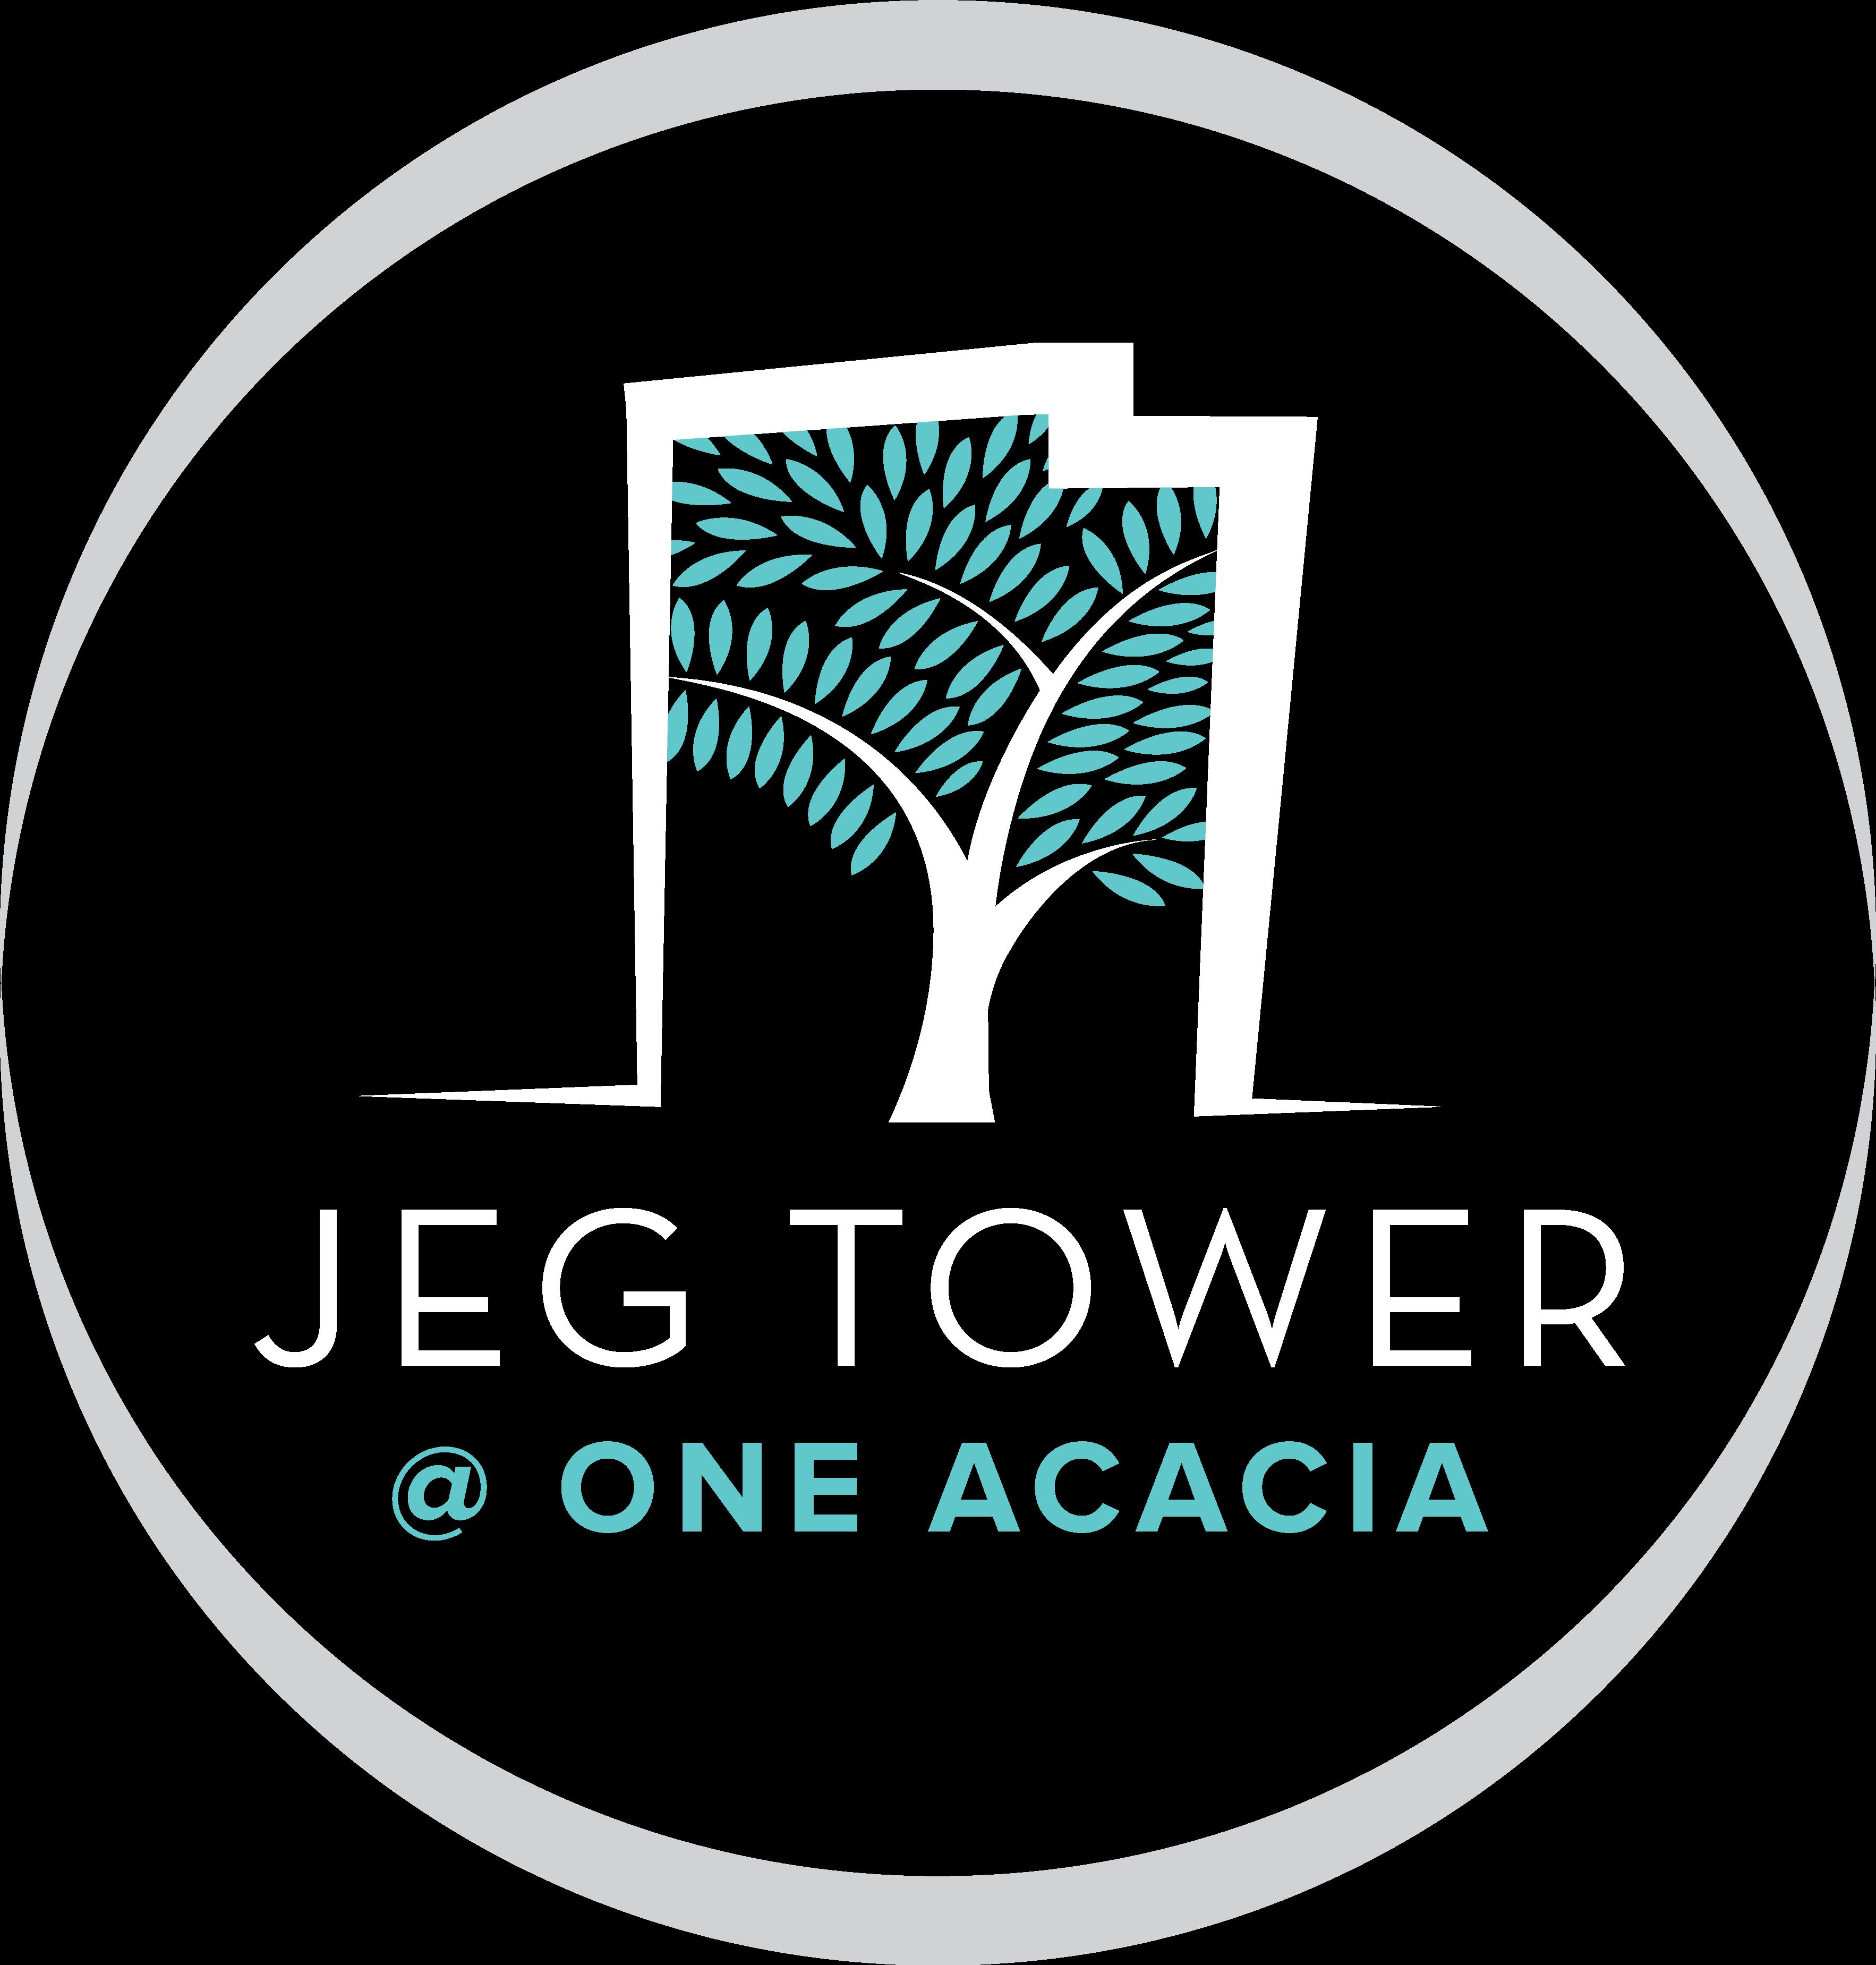 JEG Tower